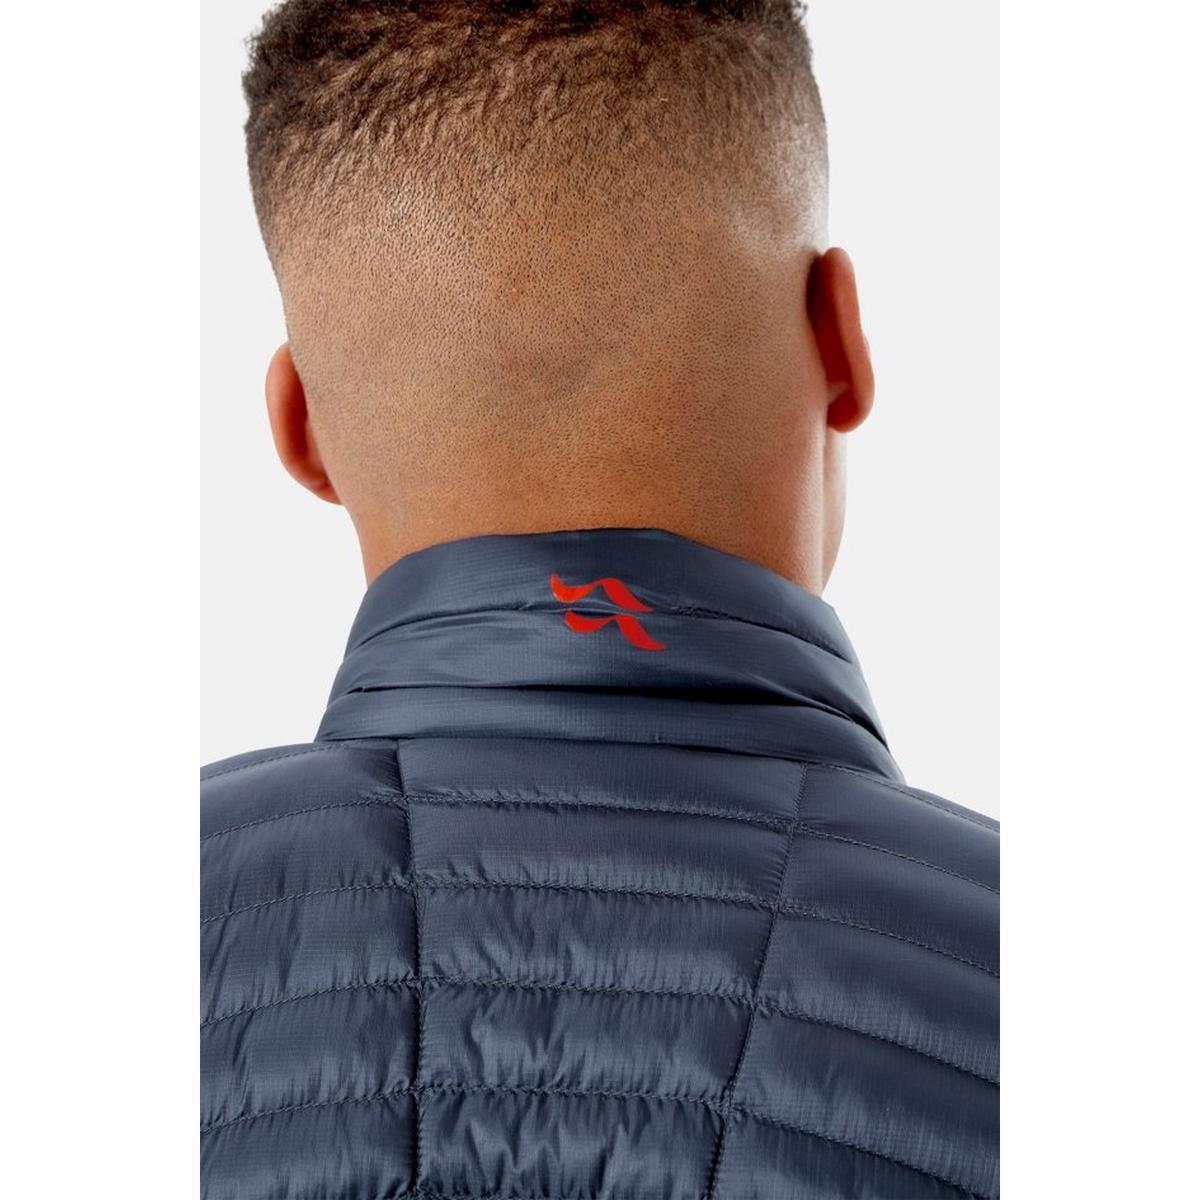 Rab Men's Cirrus Flex 2.0 Jacket